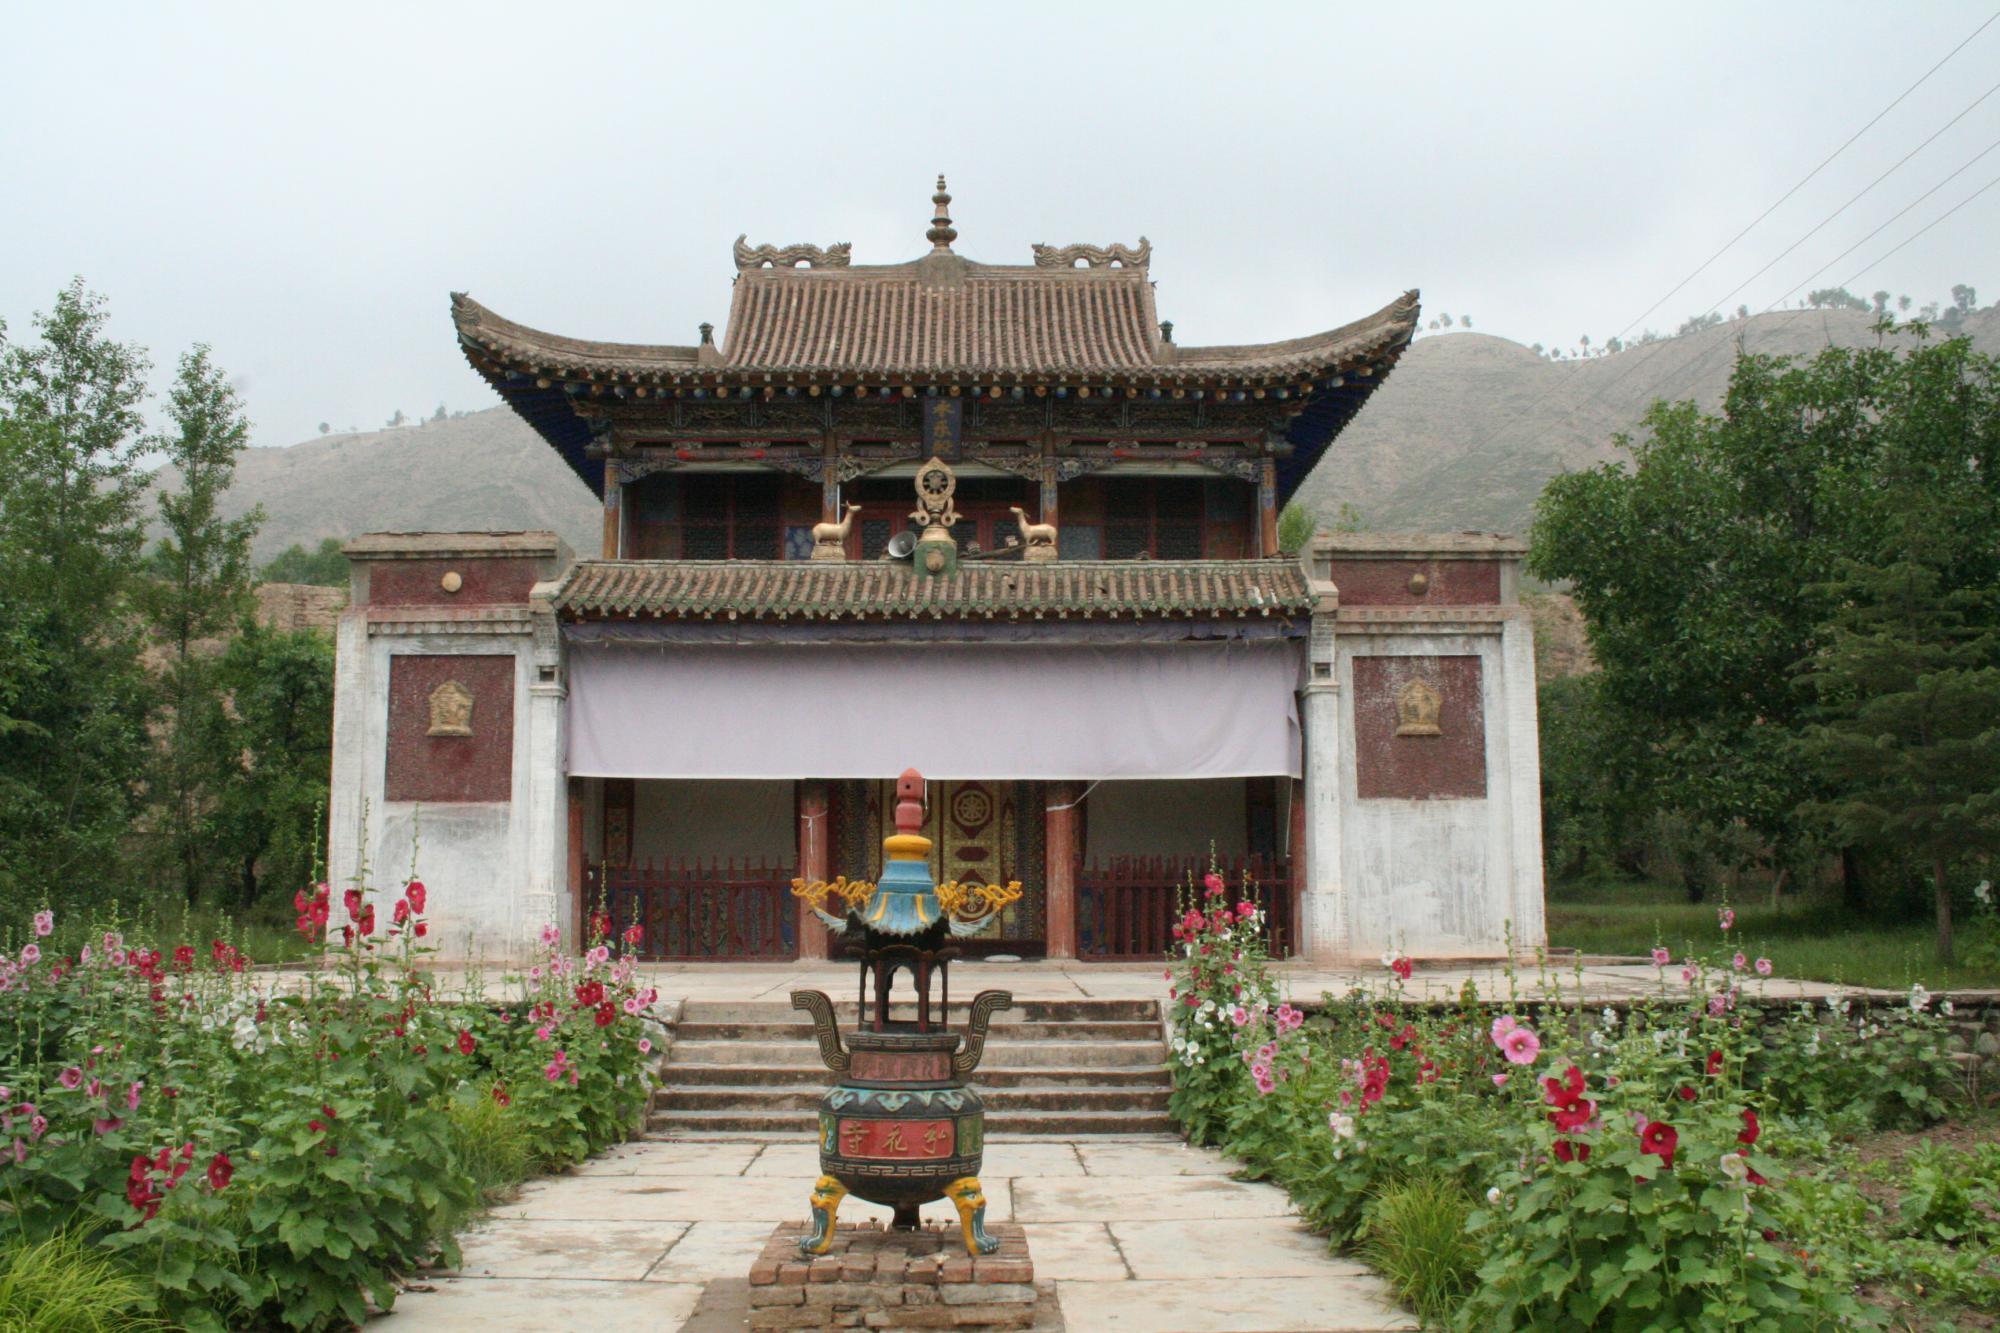 Image of Assembly Hall Exterior, Dzomokhar Monastery